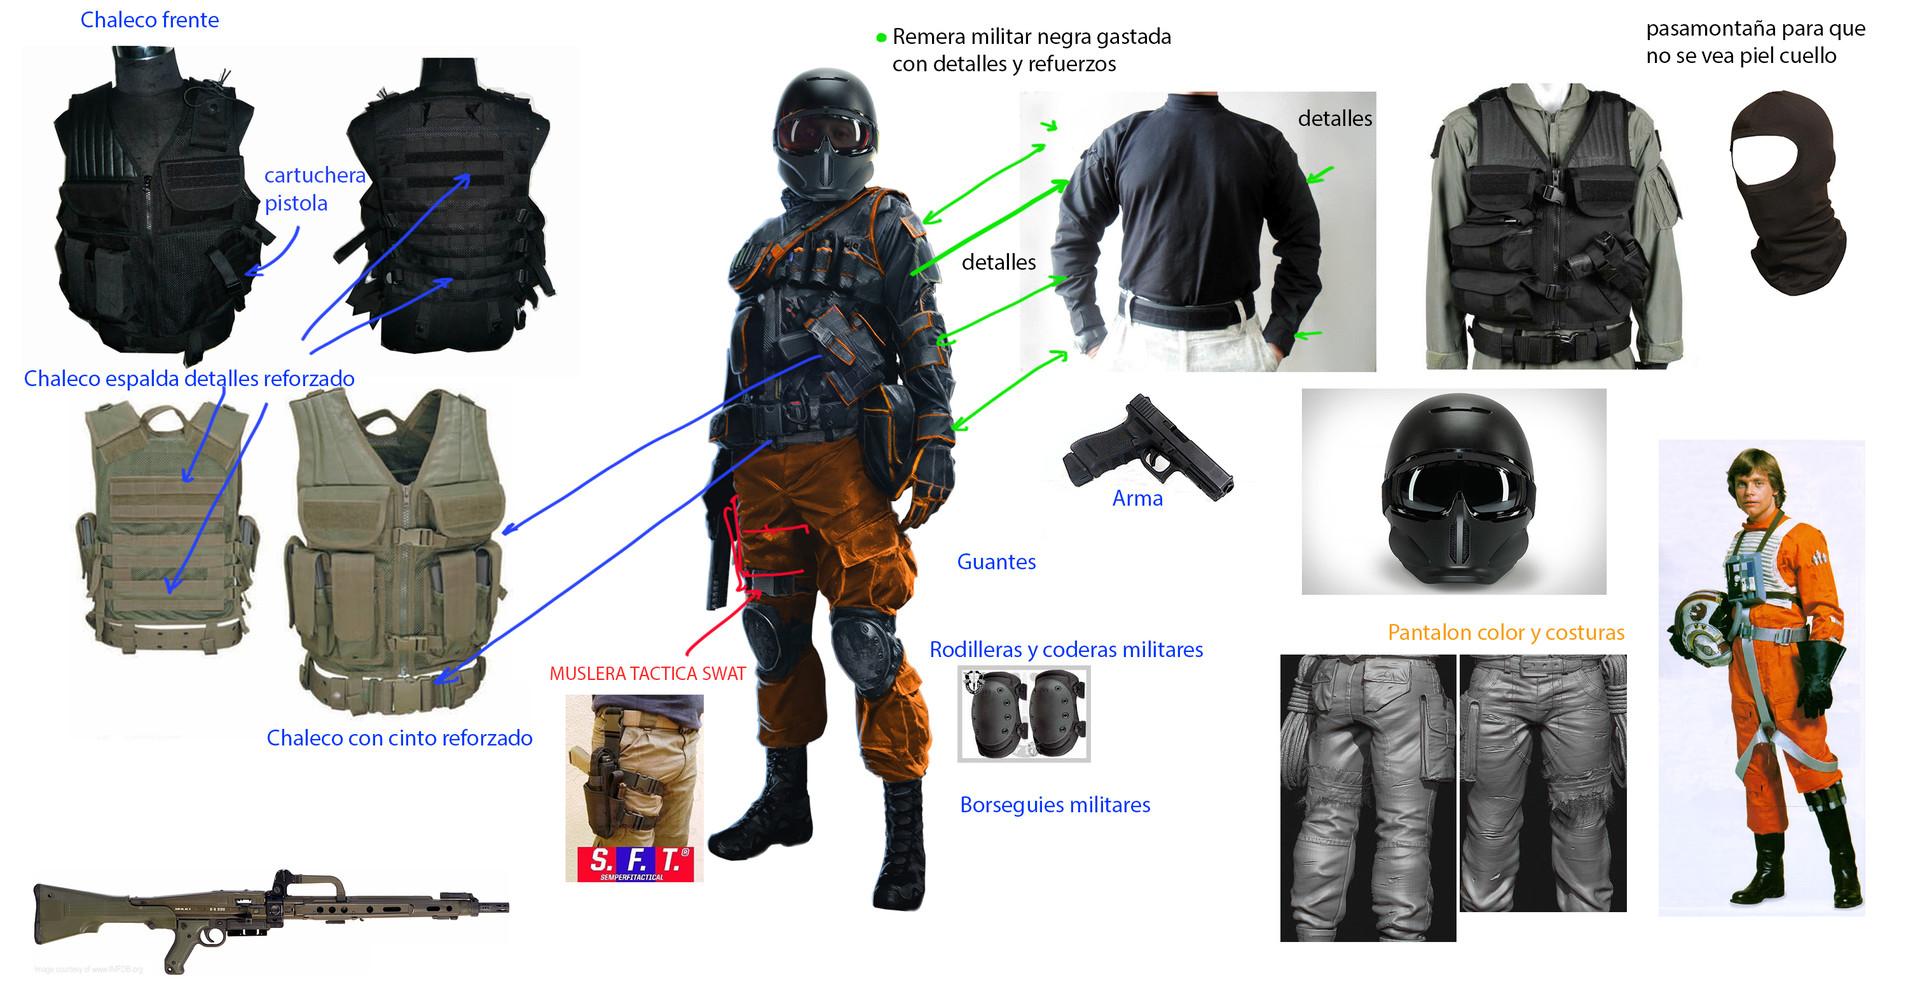 Pablo olivera uncanny valley vestuario costume design